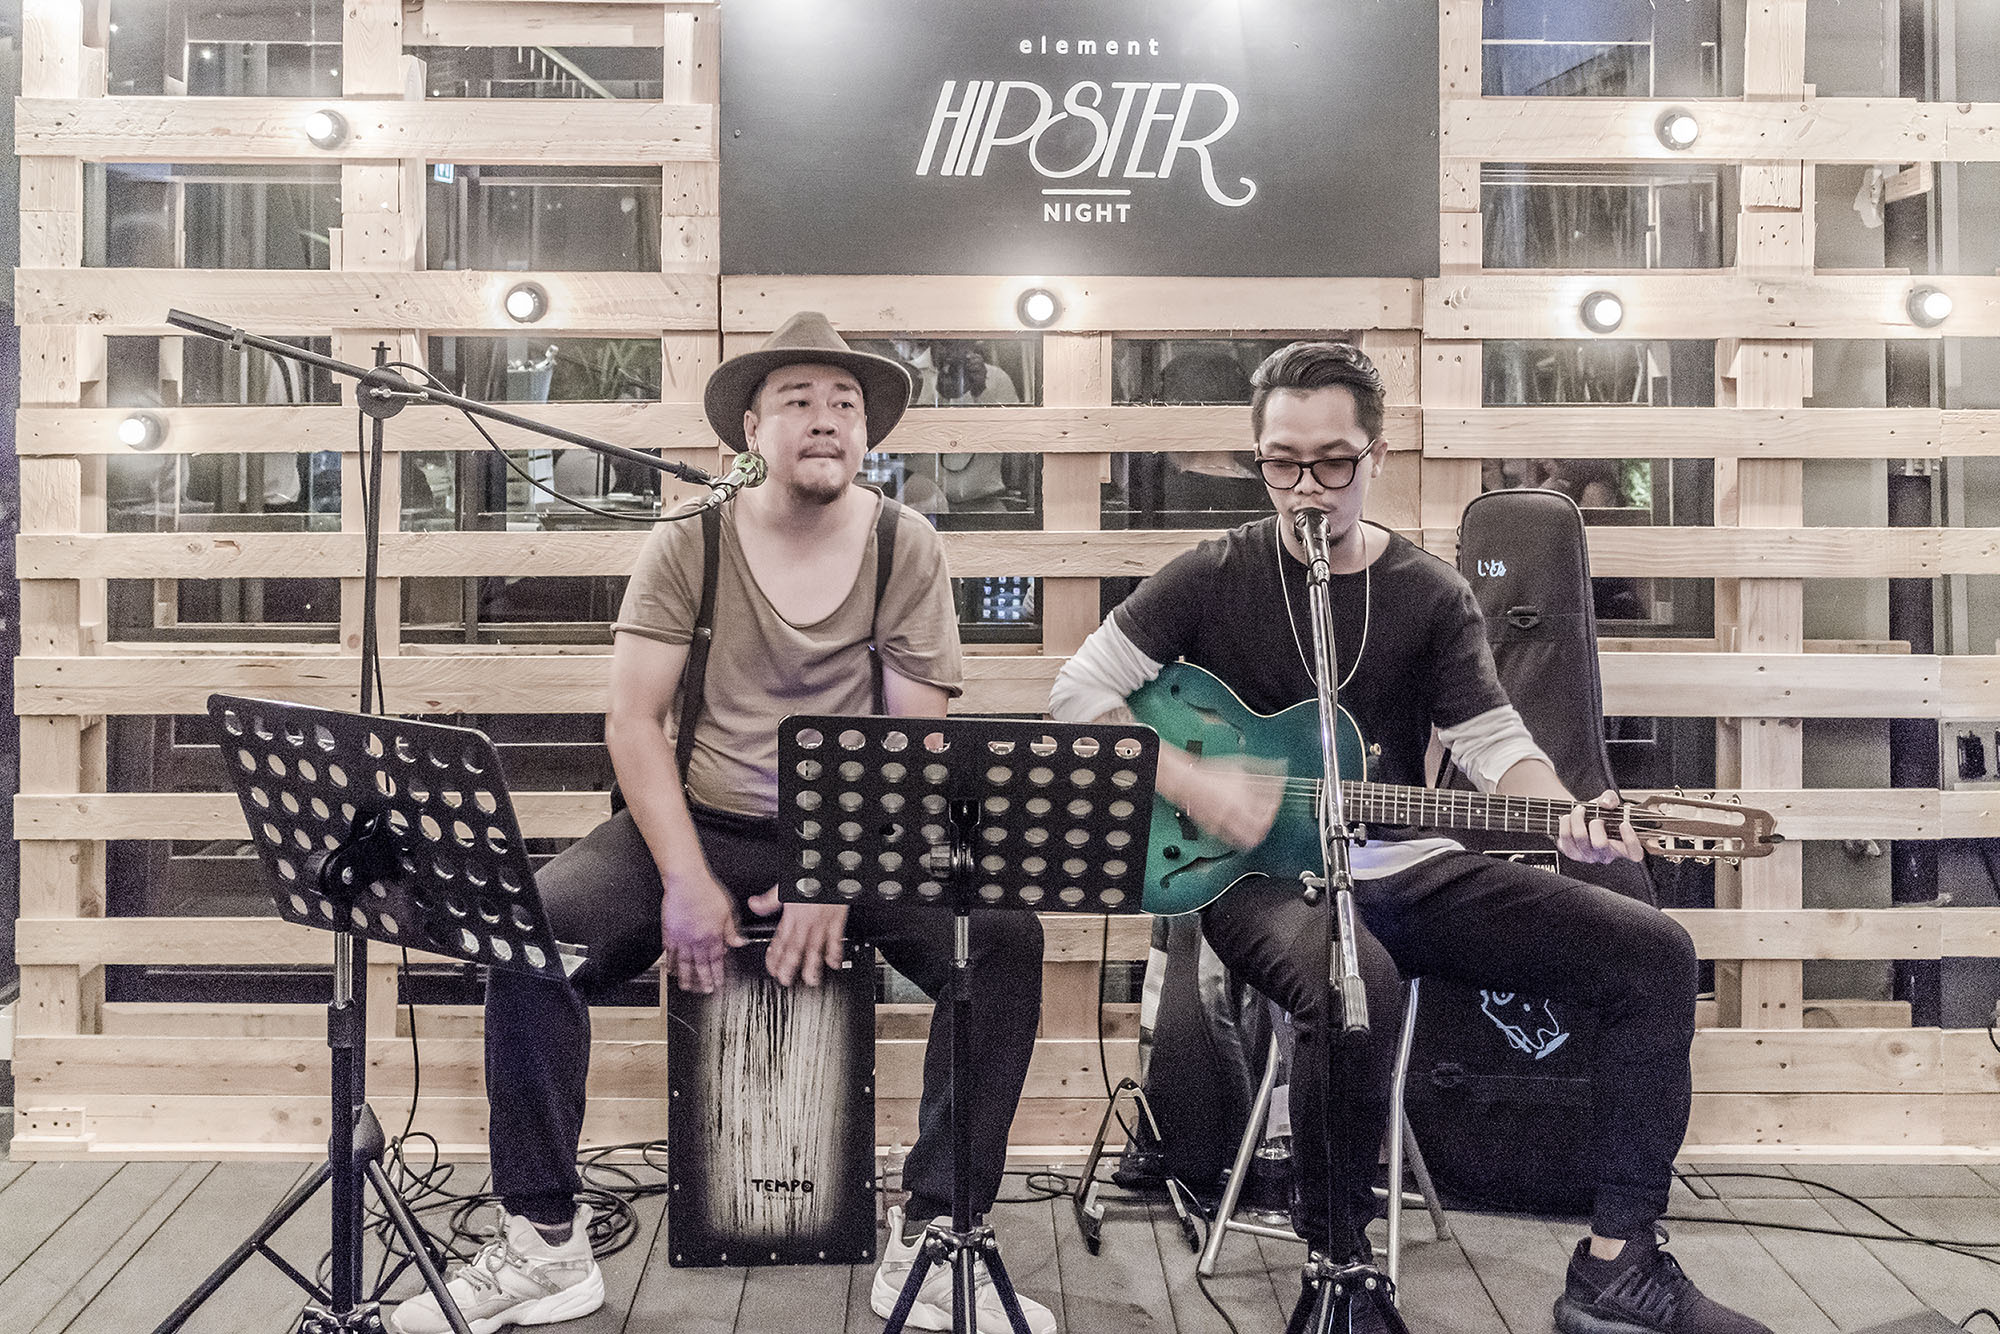 Hipster Night Amara Bangkok Hotel  Hipster Night Amara Bangkok Hotel IMG 7958